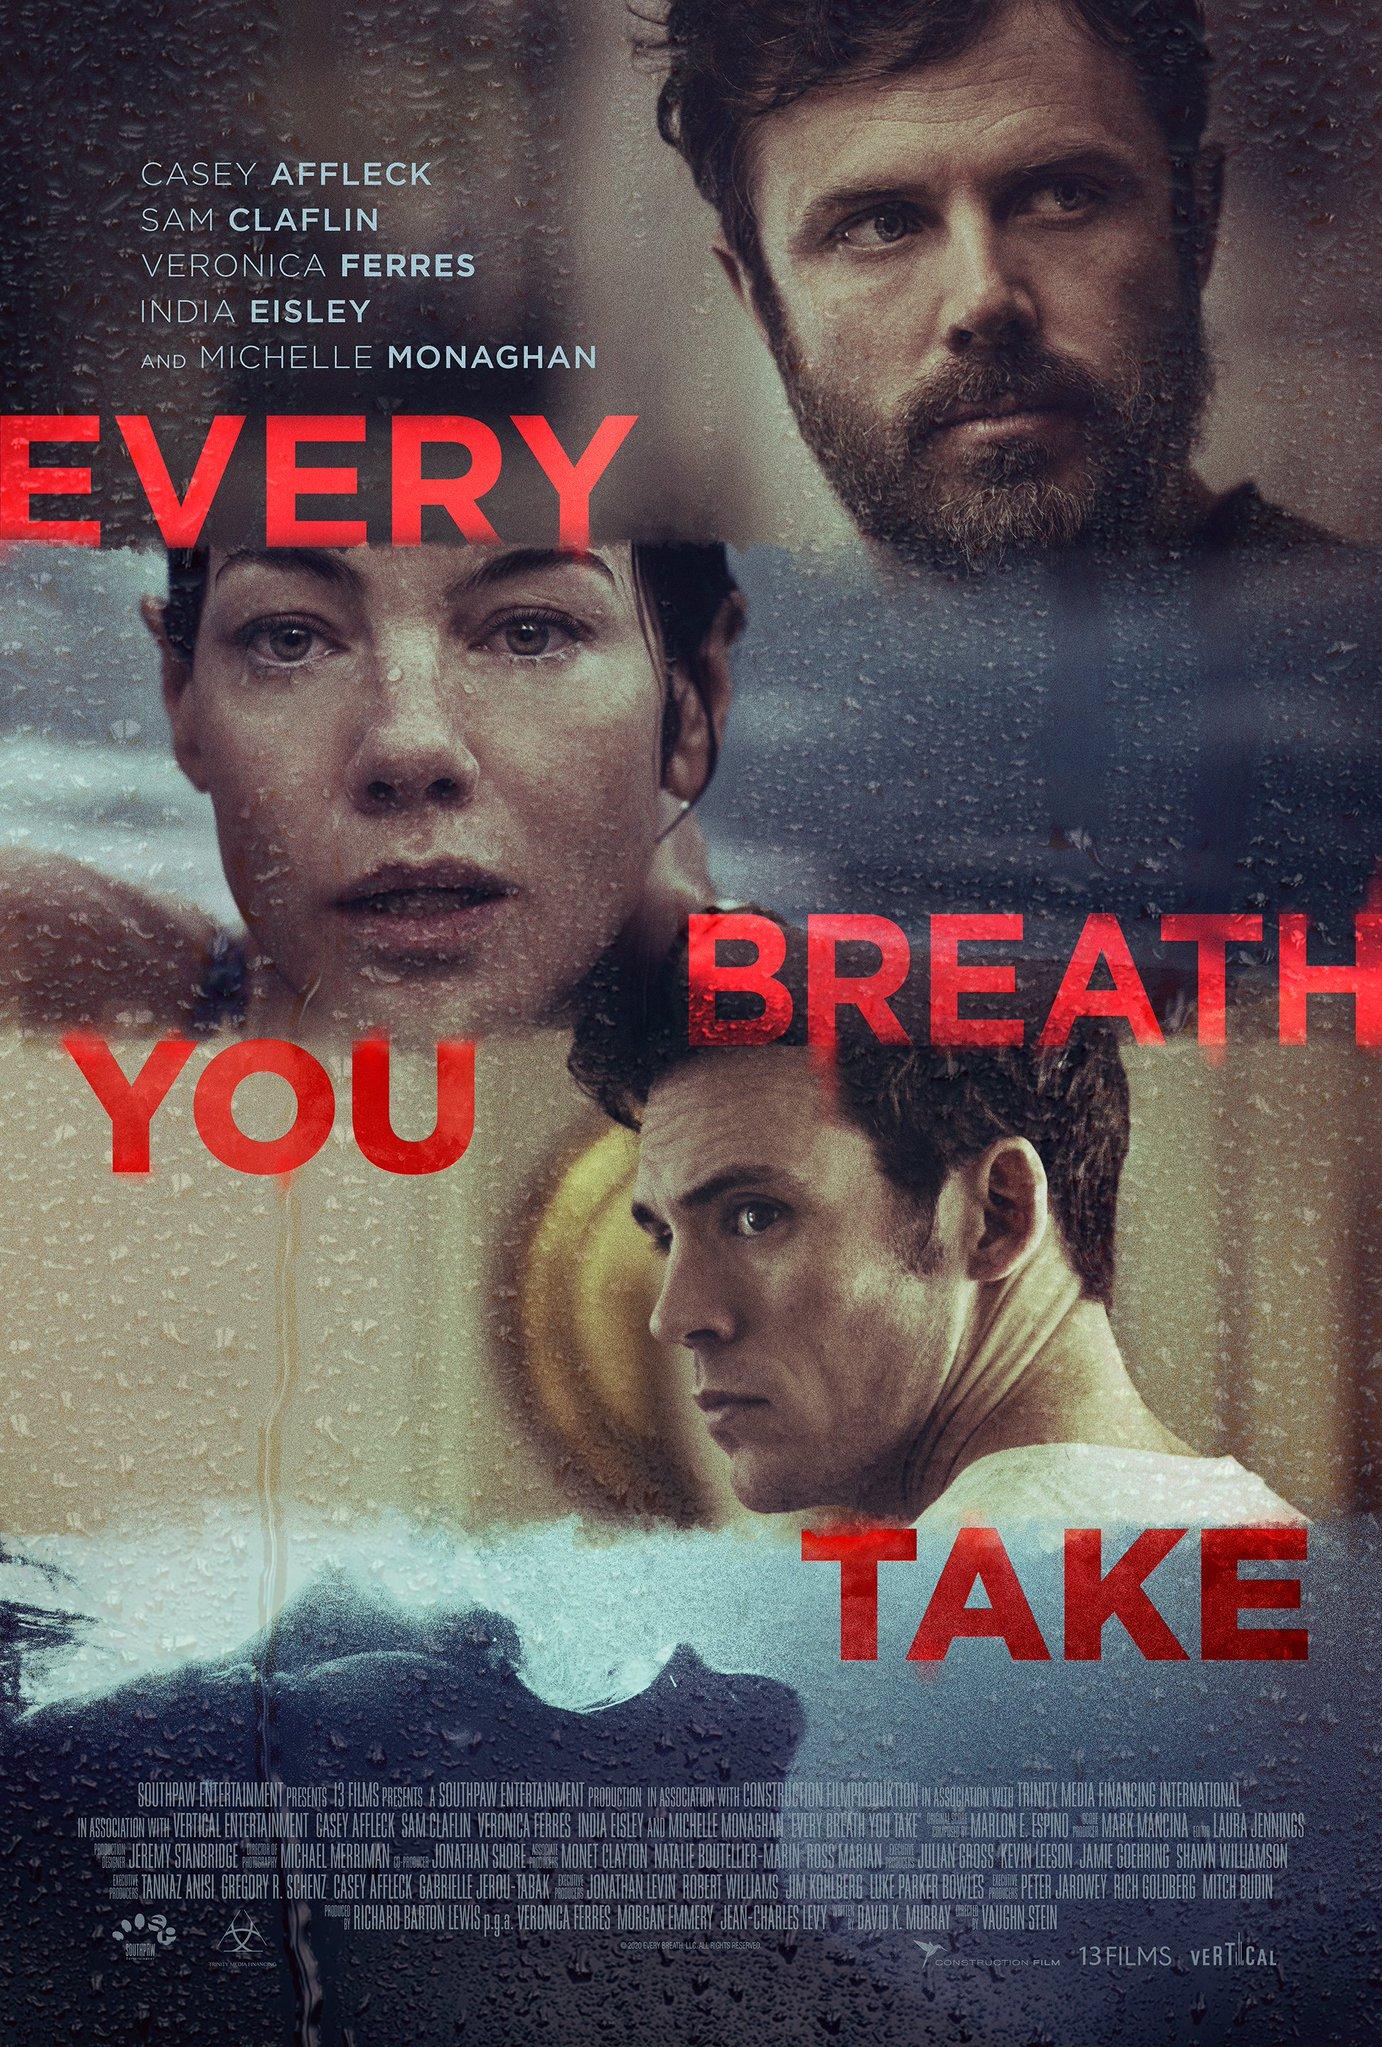 Every Breath You Take (2021) - IMDb